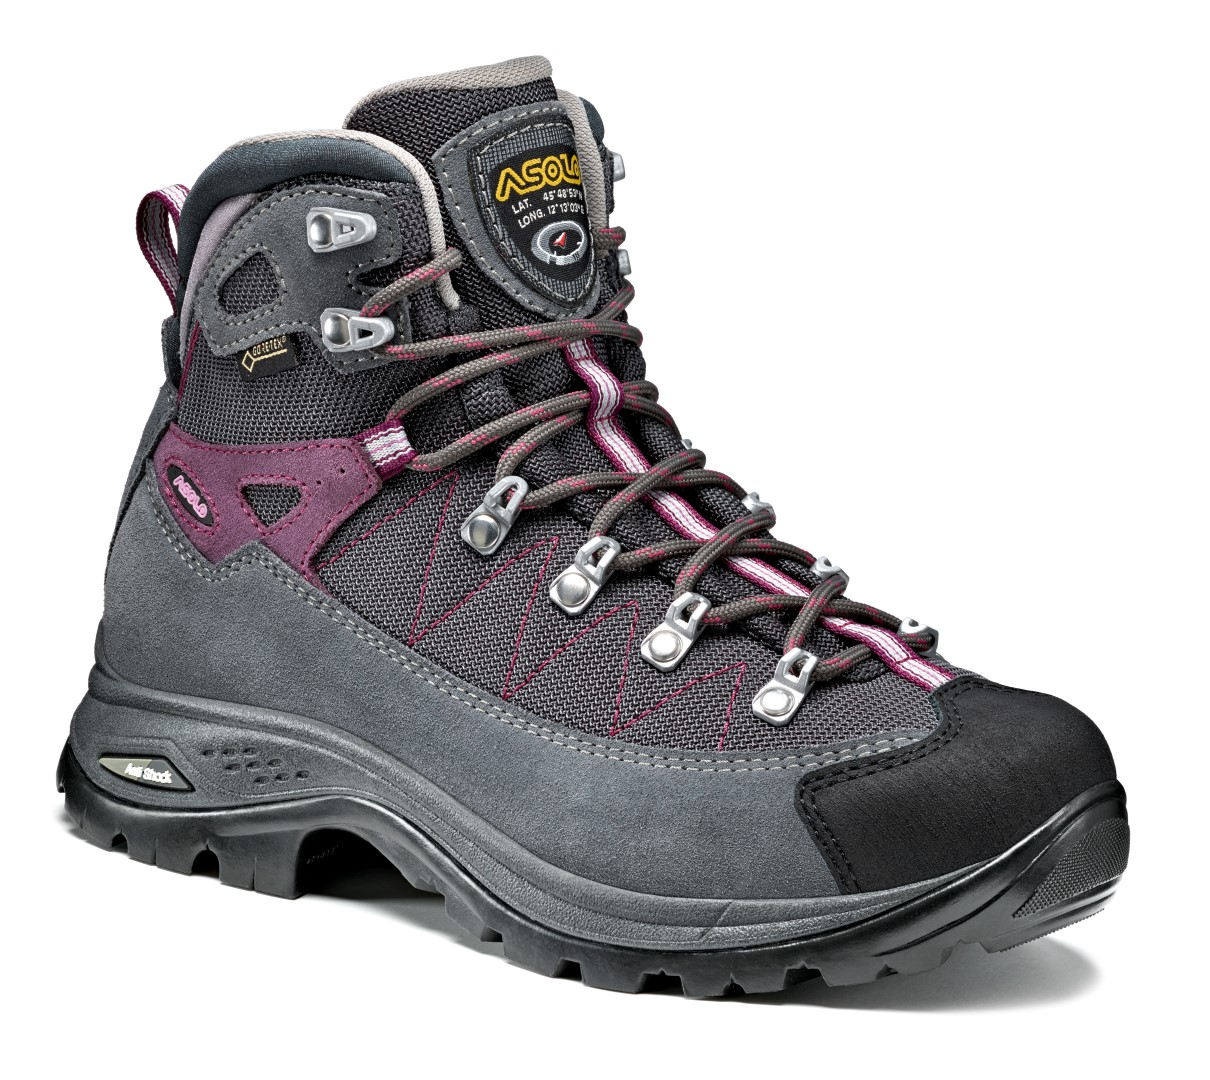 828716c2116e dámske turistické topánky ASOLO Finder GV grapeade - BERG SPORT